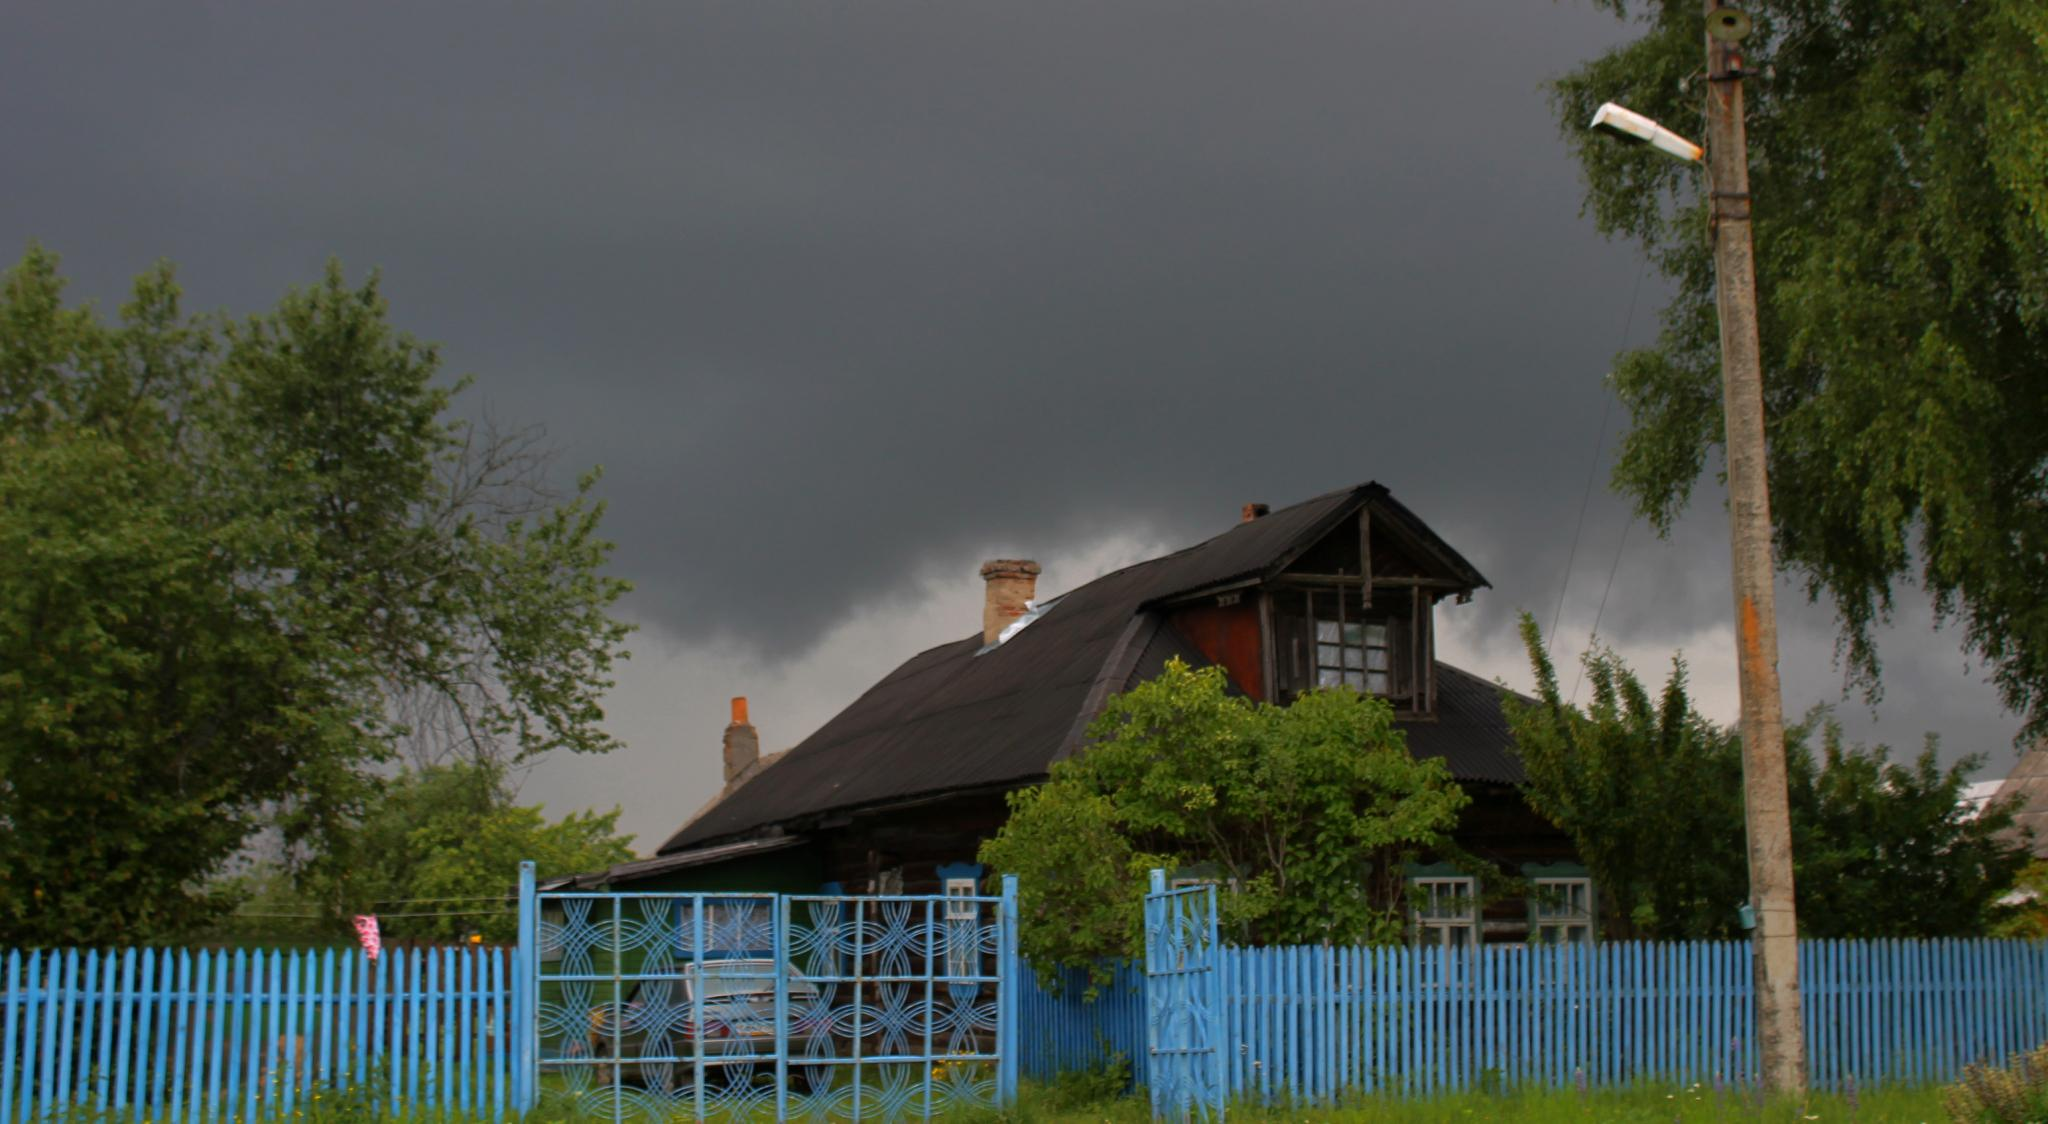 МЧС объявило метеопредупреждение в Кирово-Чепецке